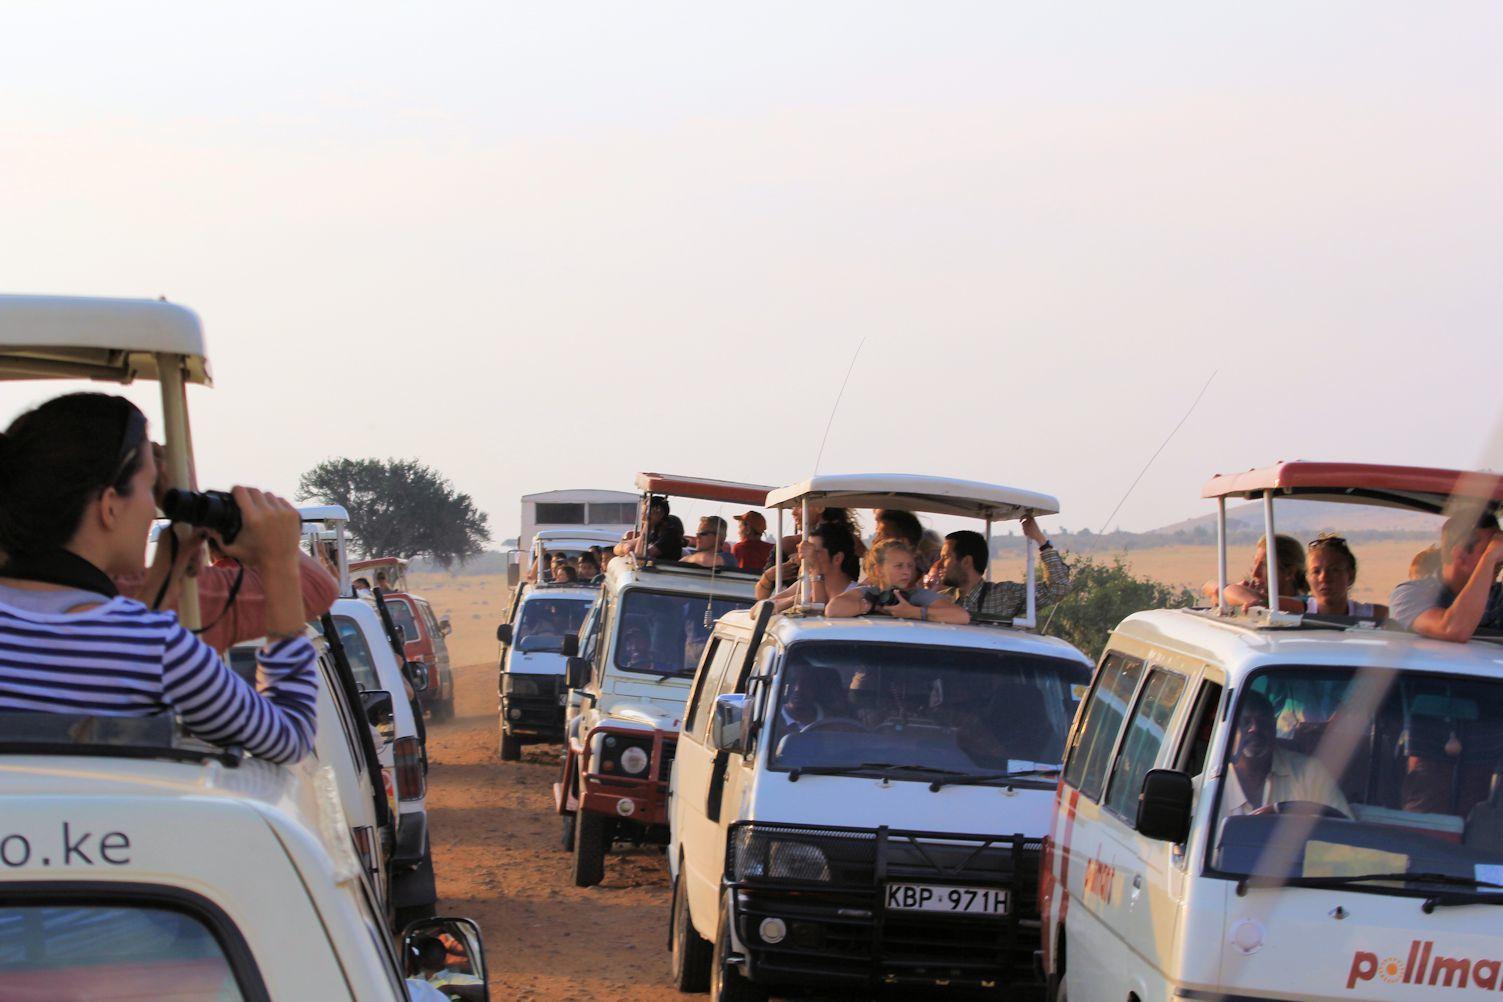 Traffic jams in Maasai Mara National Reserve